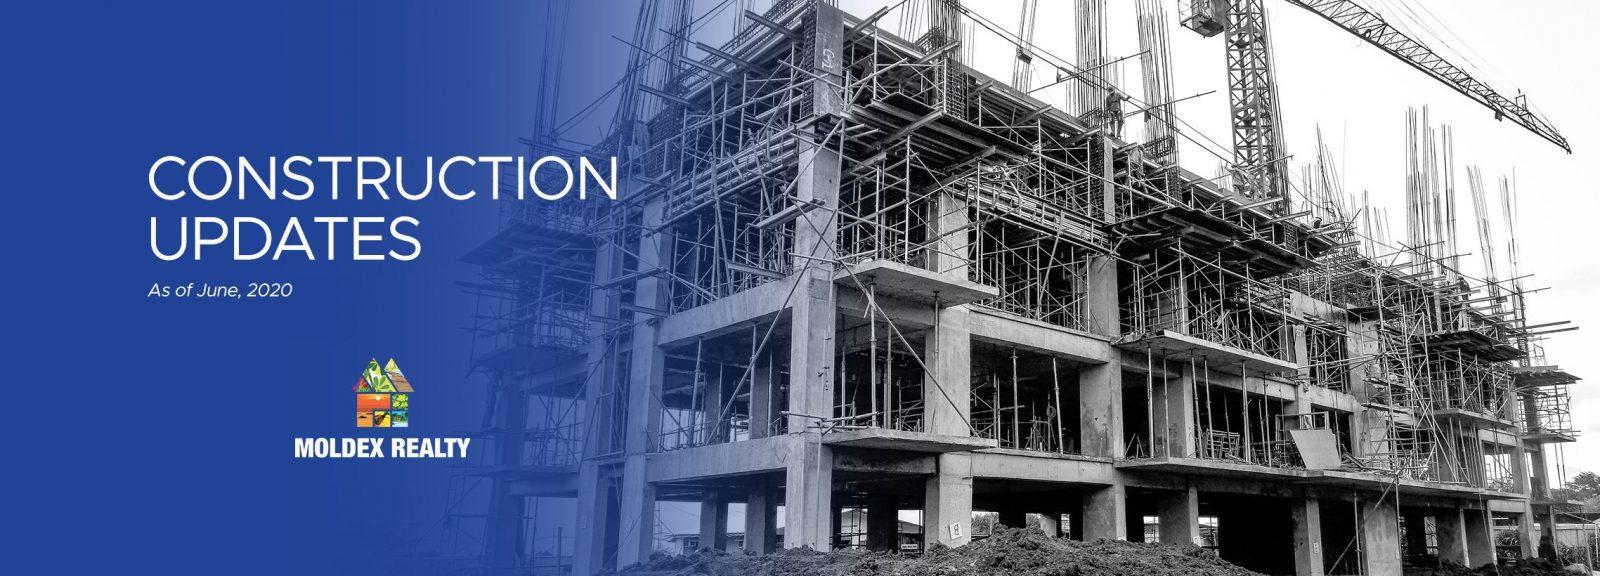 Construction Updates (June 2020)